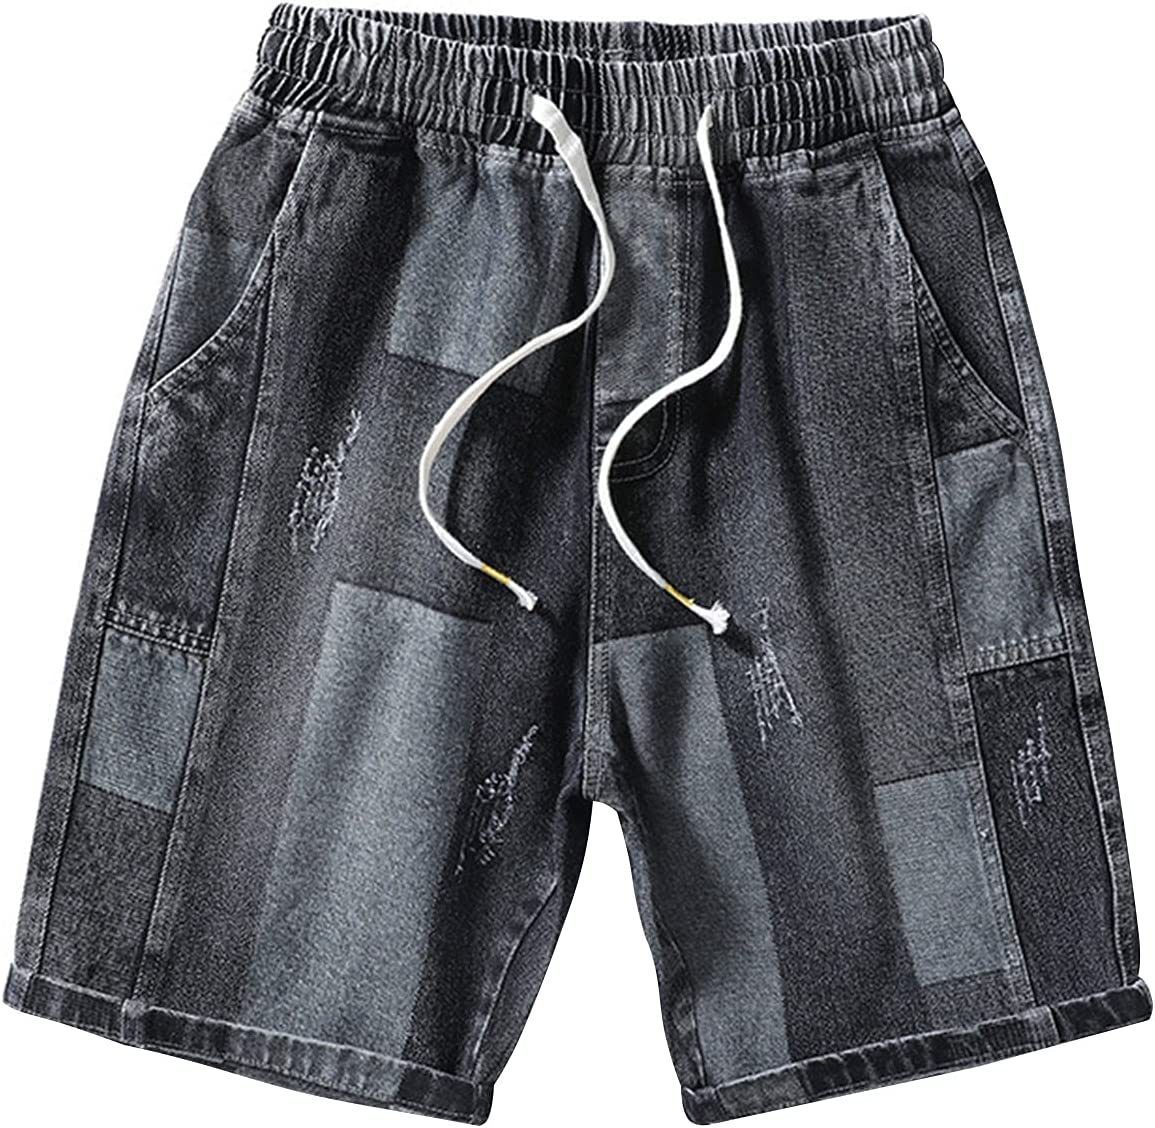 Men's Casual Baggy Straight Fit Jean Shorts Drawstring Jogging Denim Short Knee Length Splicing Summer Ripped Jeans Shorts (Black 3,Large)